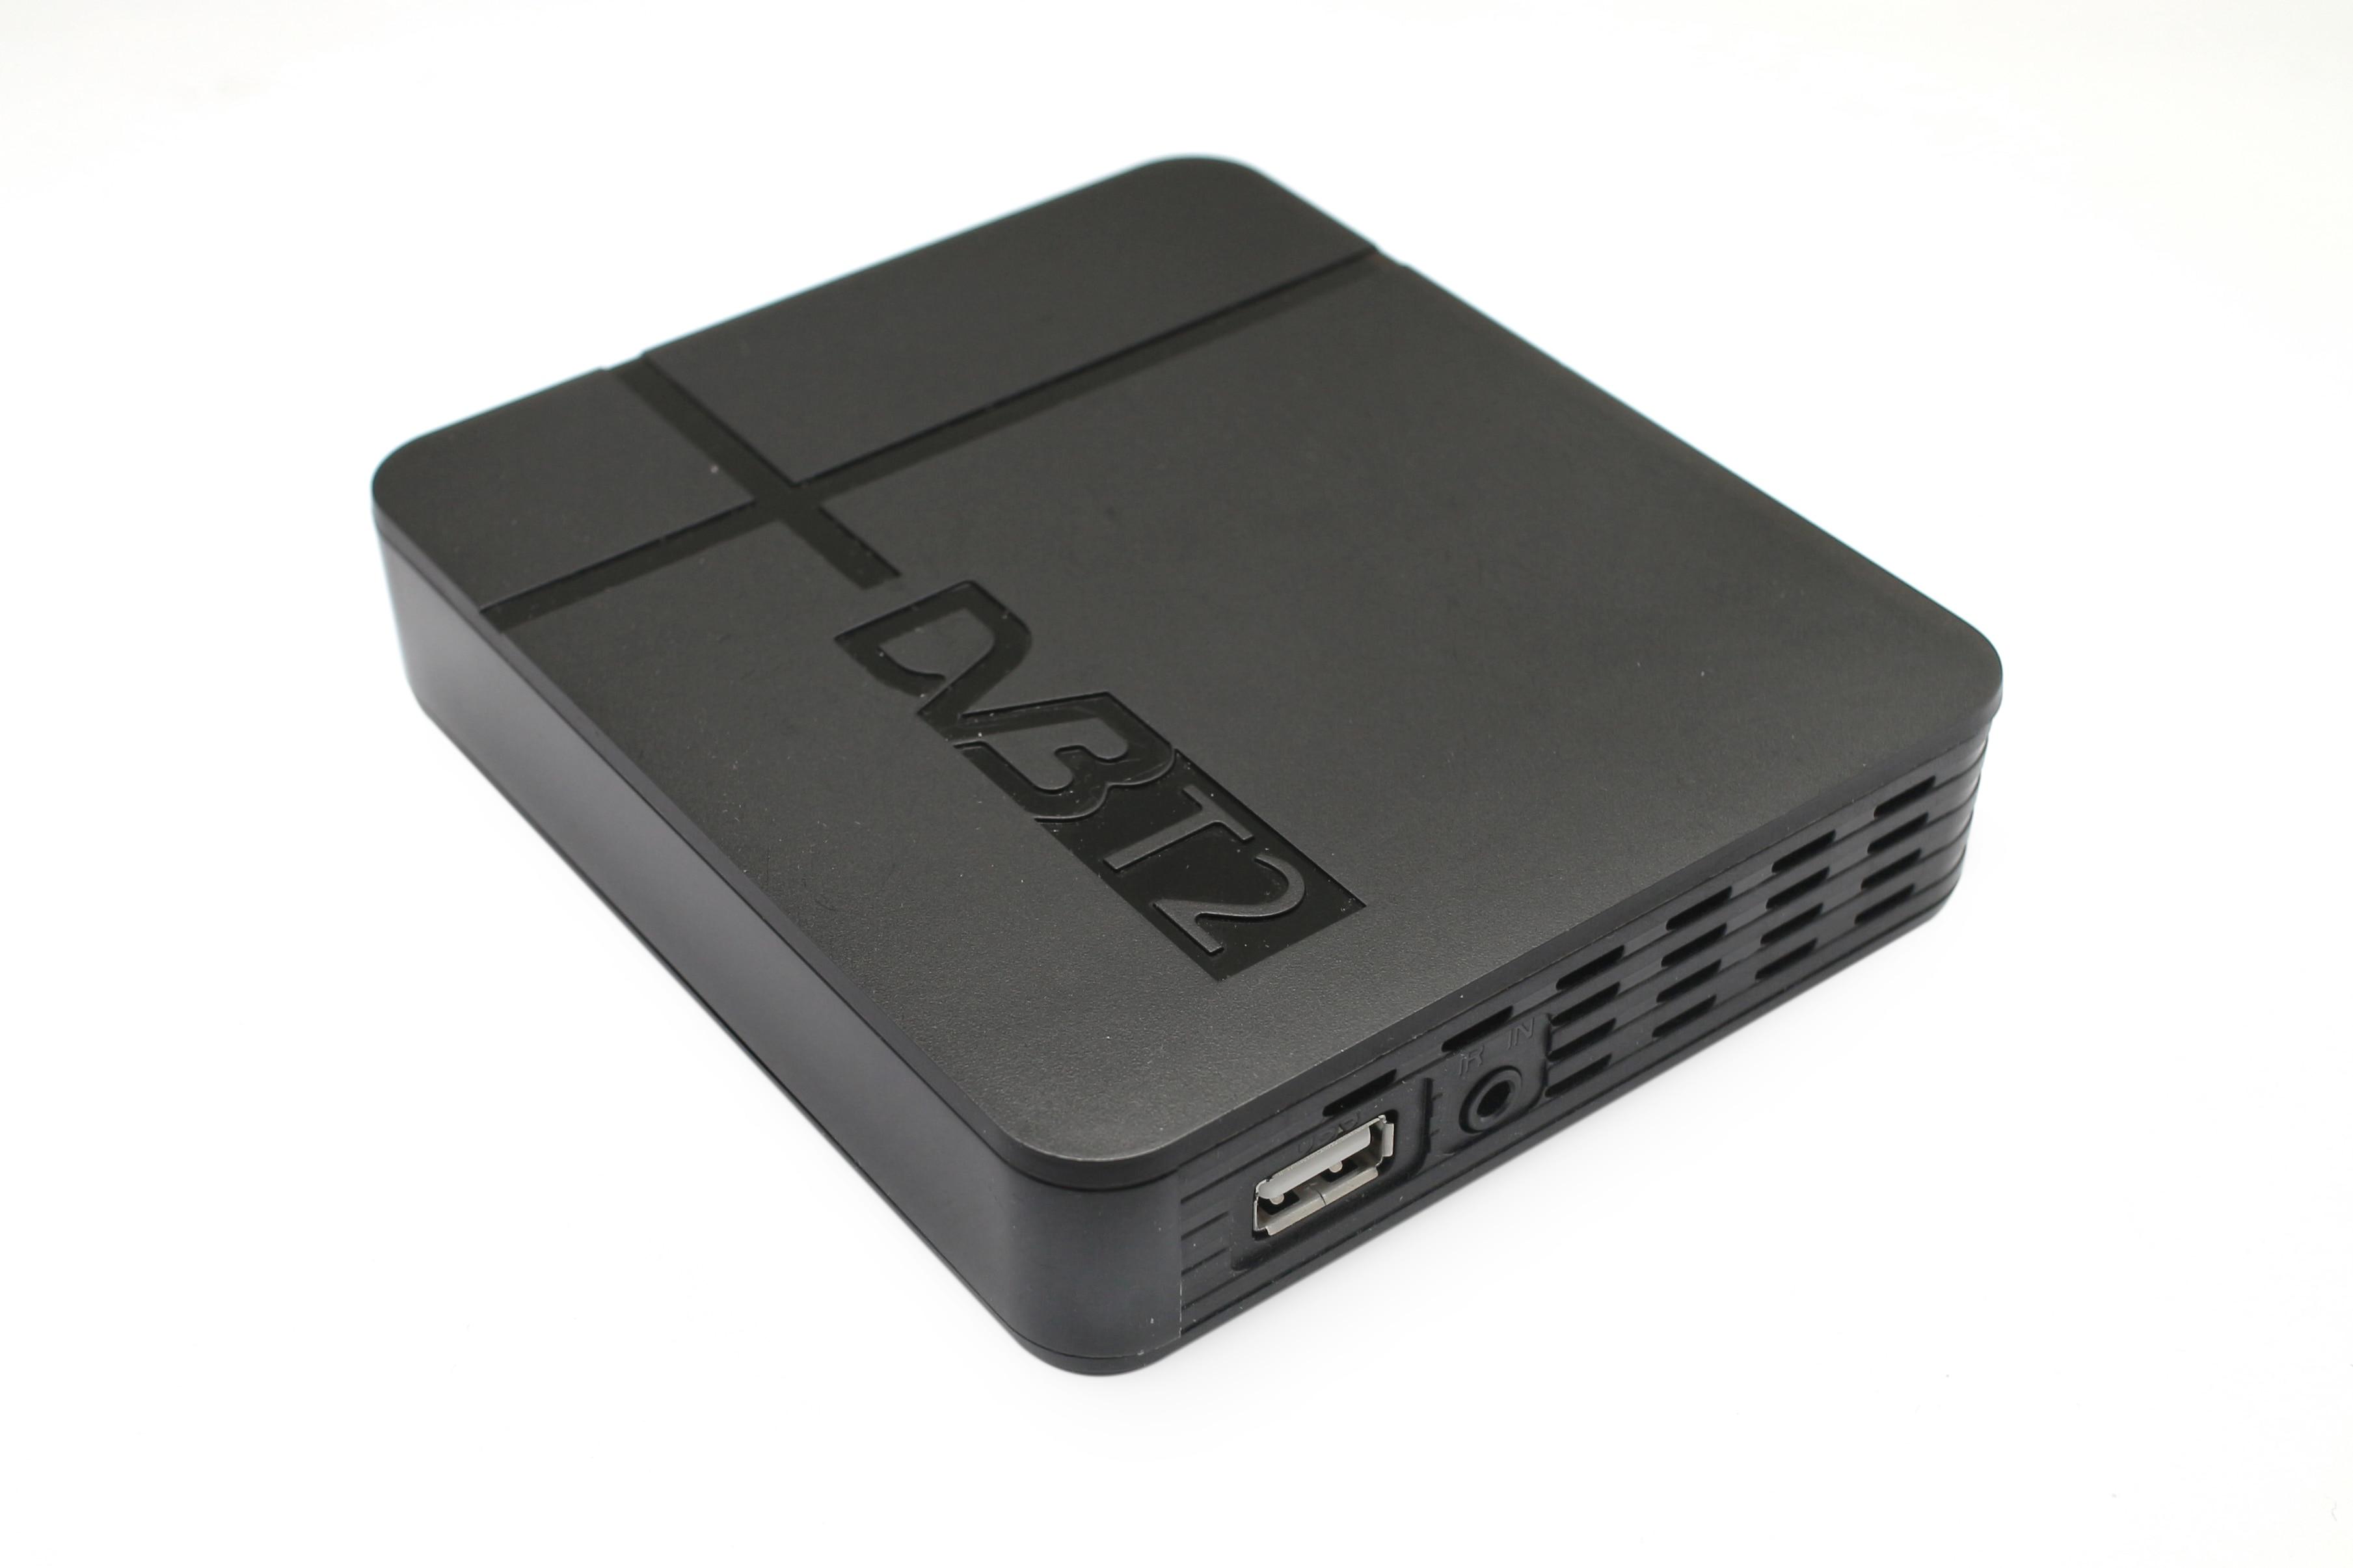 TV Box DVB T2 Digital TV Terrestrial Receiver DVB-T2 MPEG-2/-4 H.265 Support IPTV HDMI Set Top Box For Europe/Russian DVBK2max